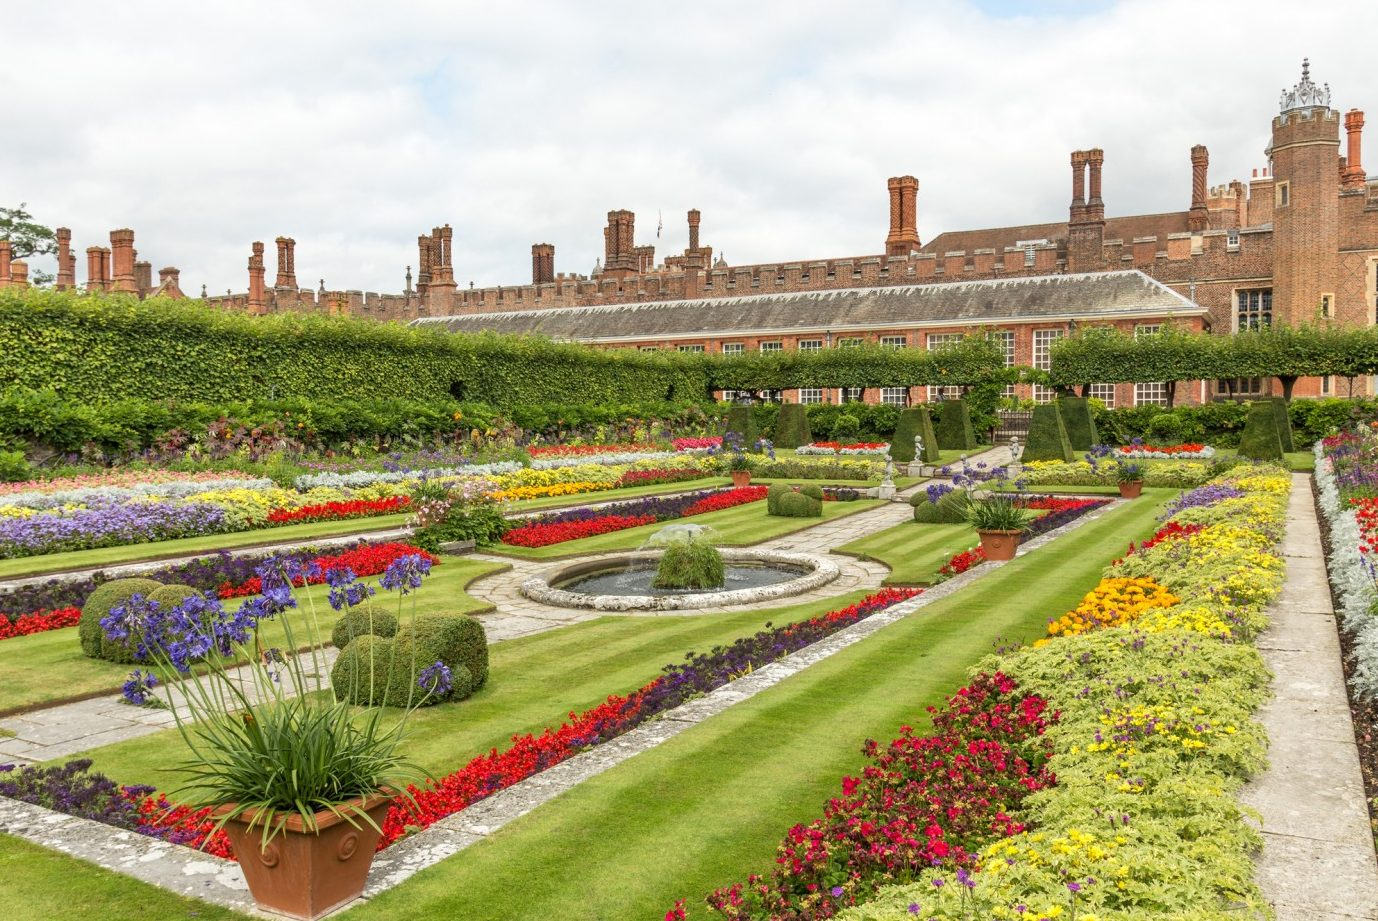 Roses In Garden: Day Trip To Hampton Court Flower Show